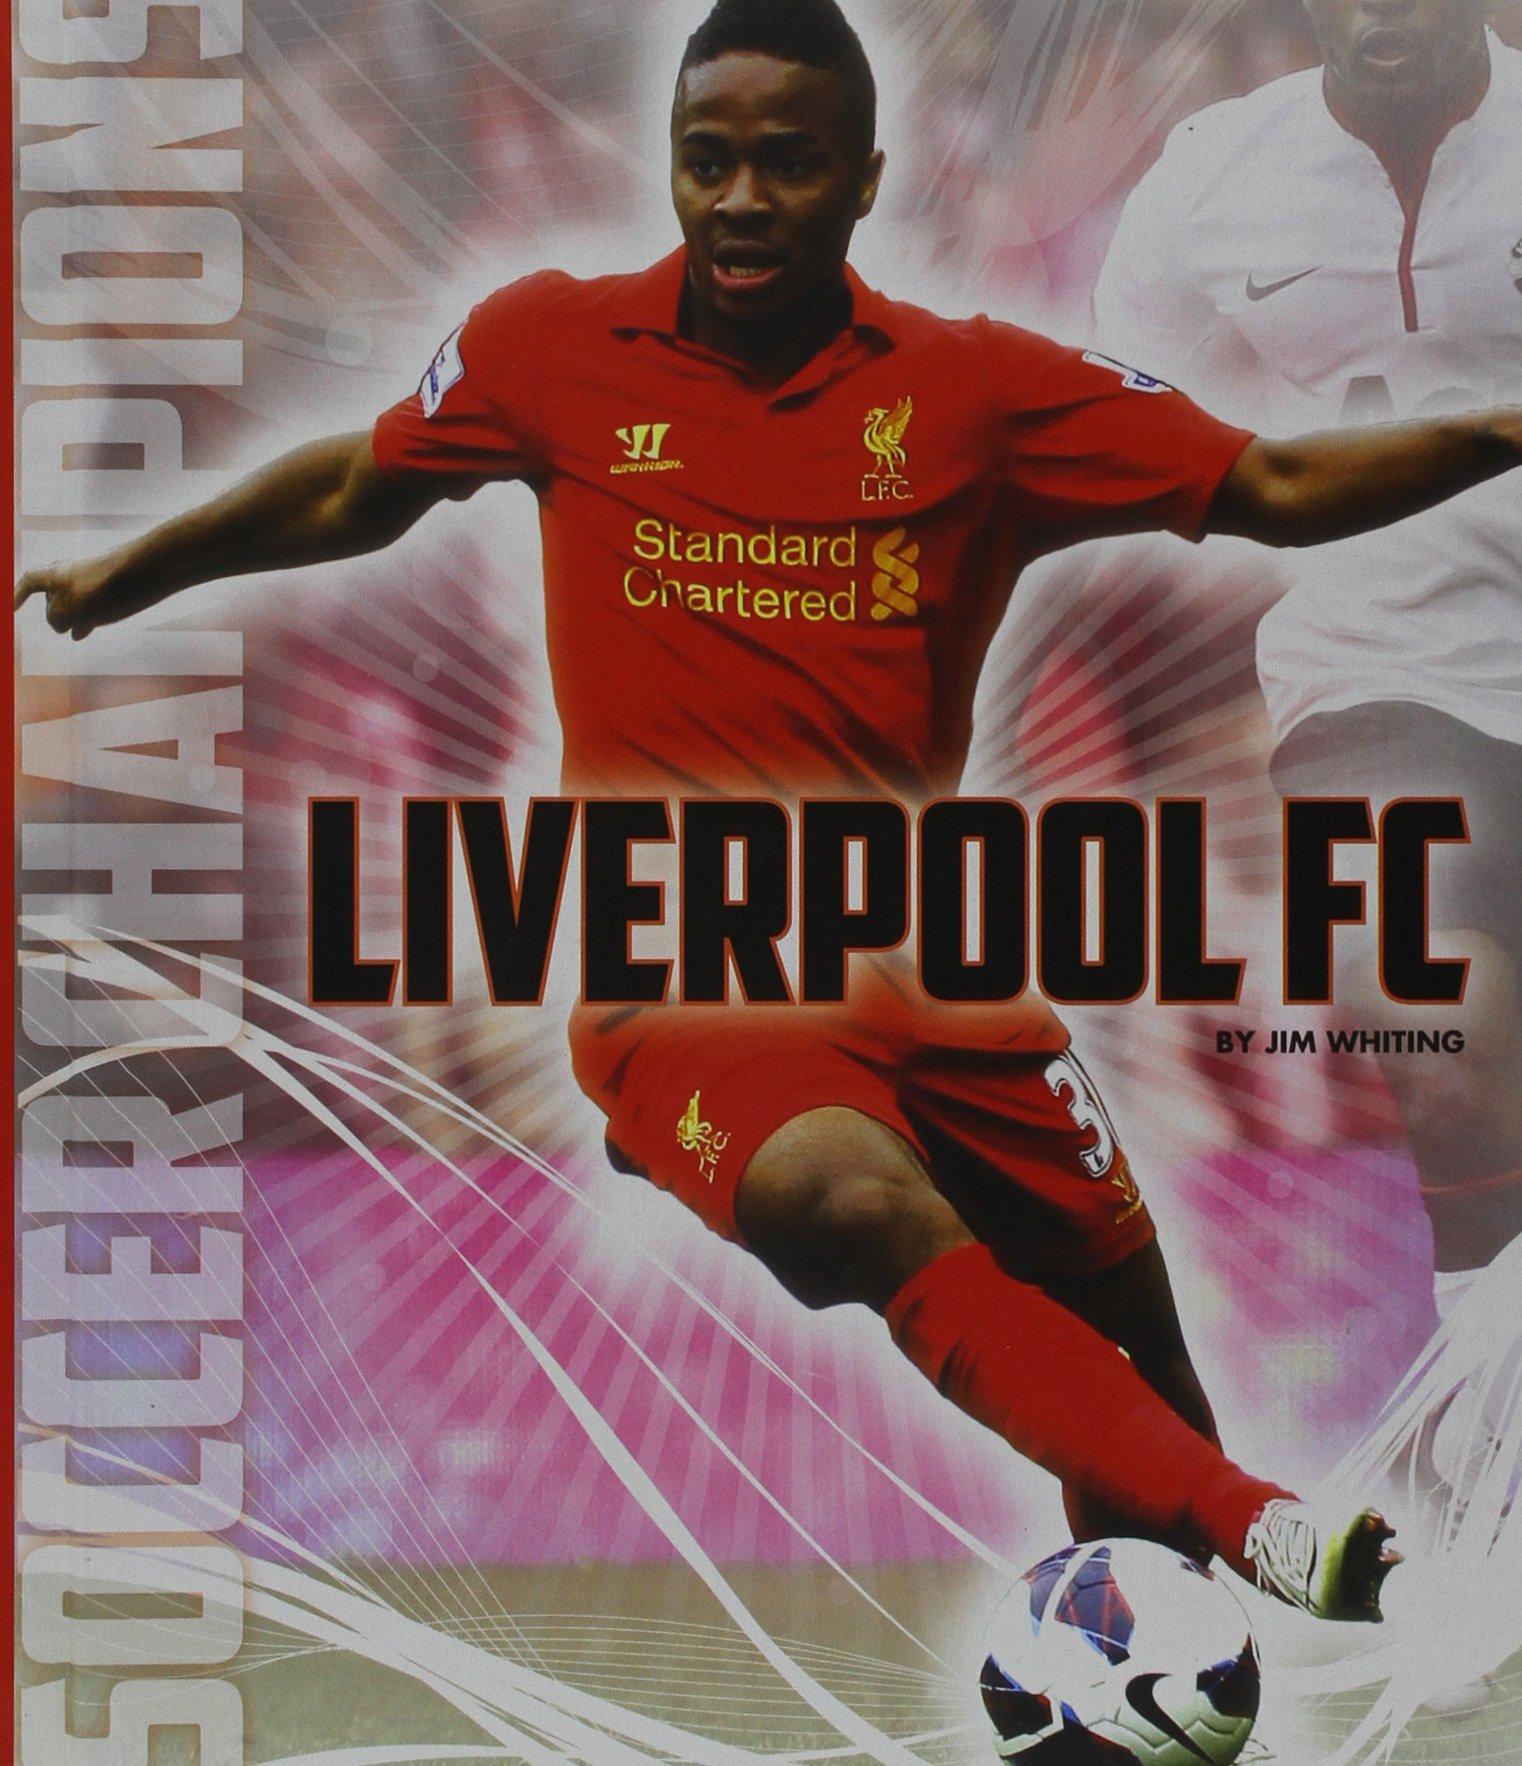 Liverpool FC (Soccer Champions)